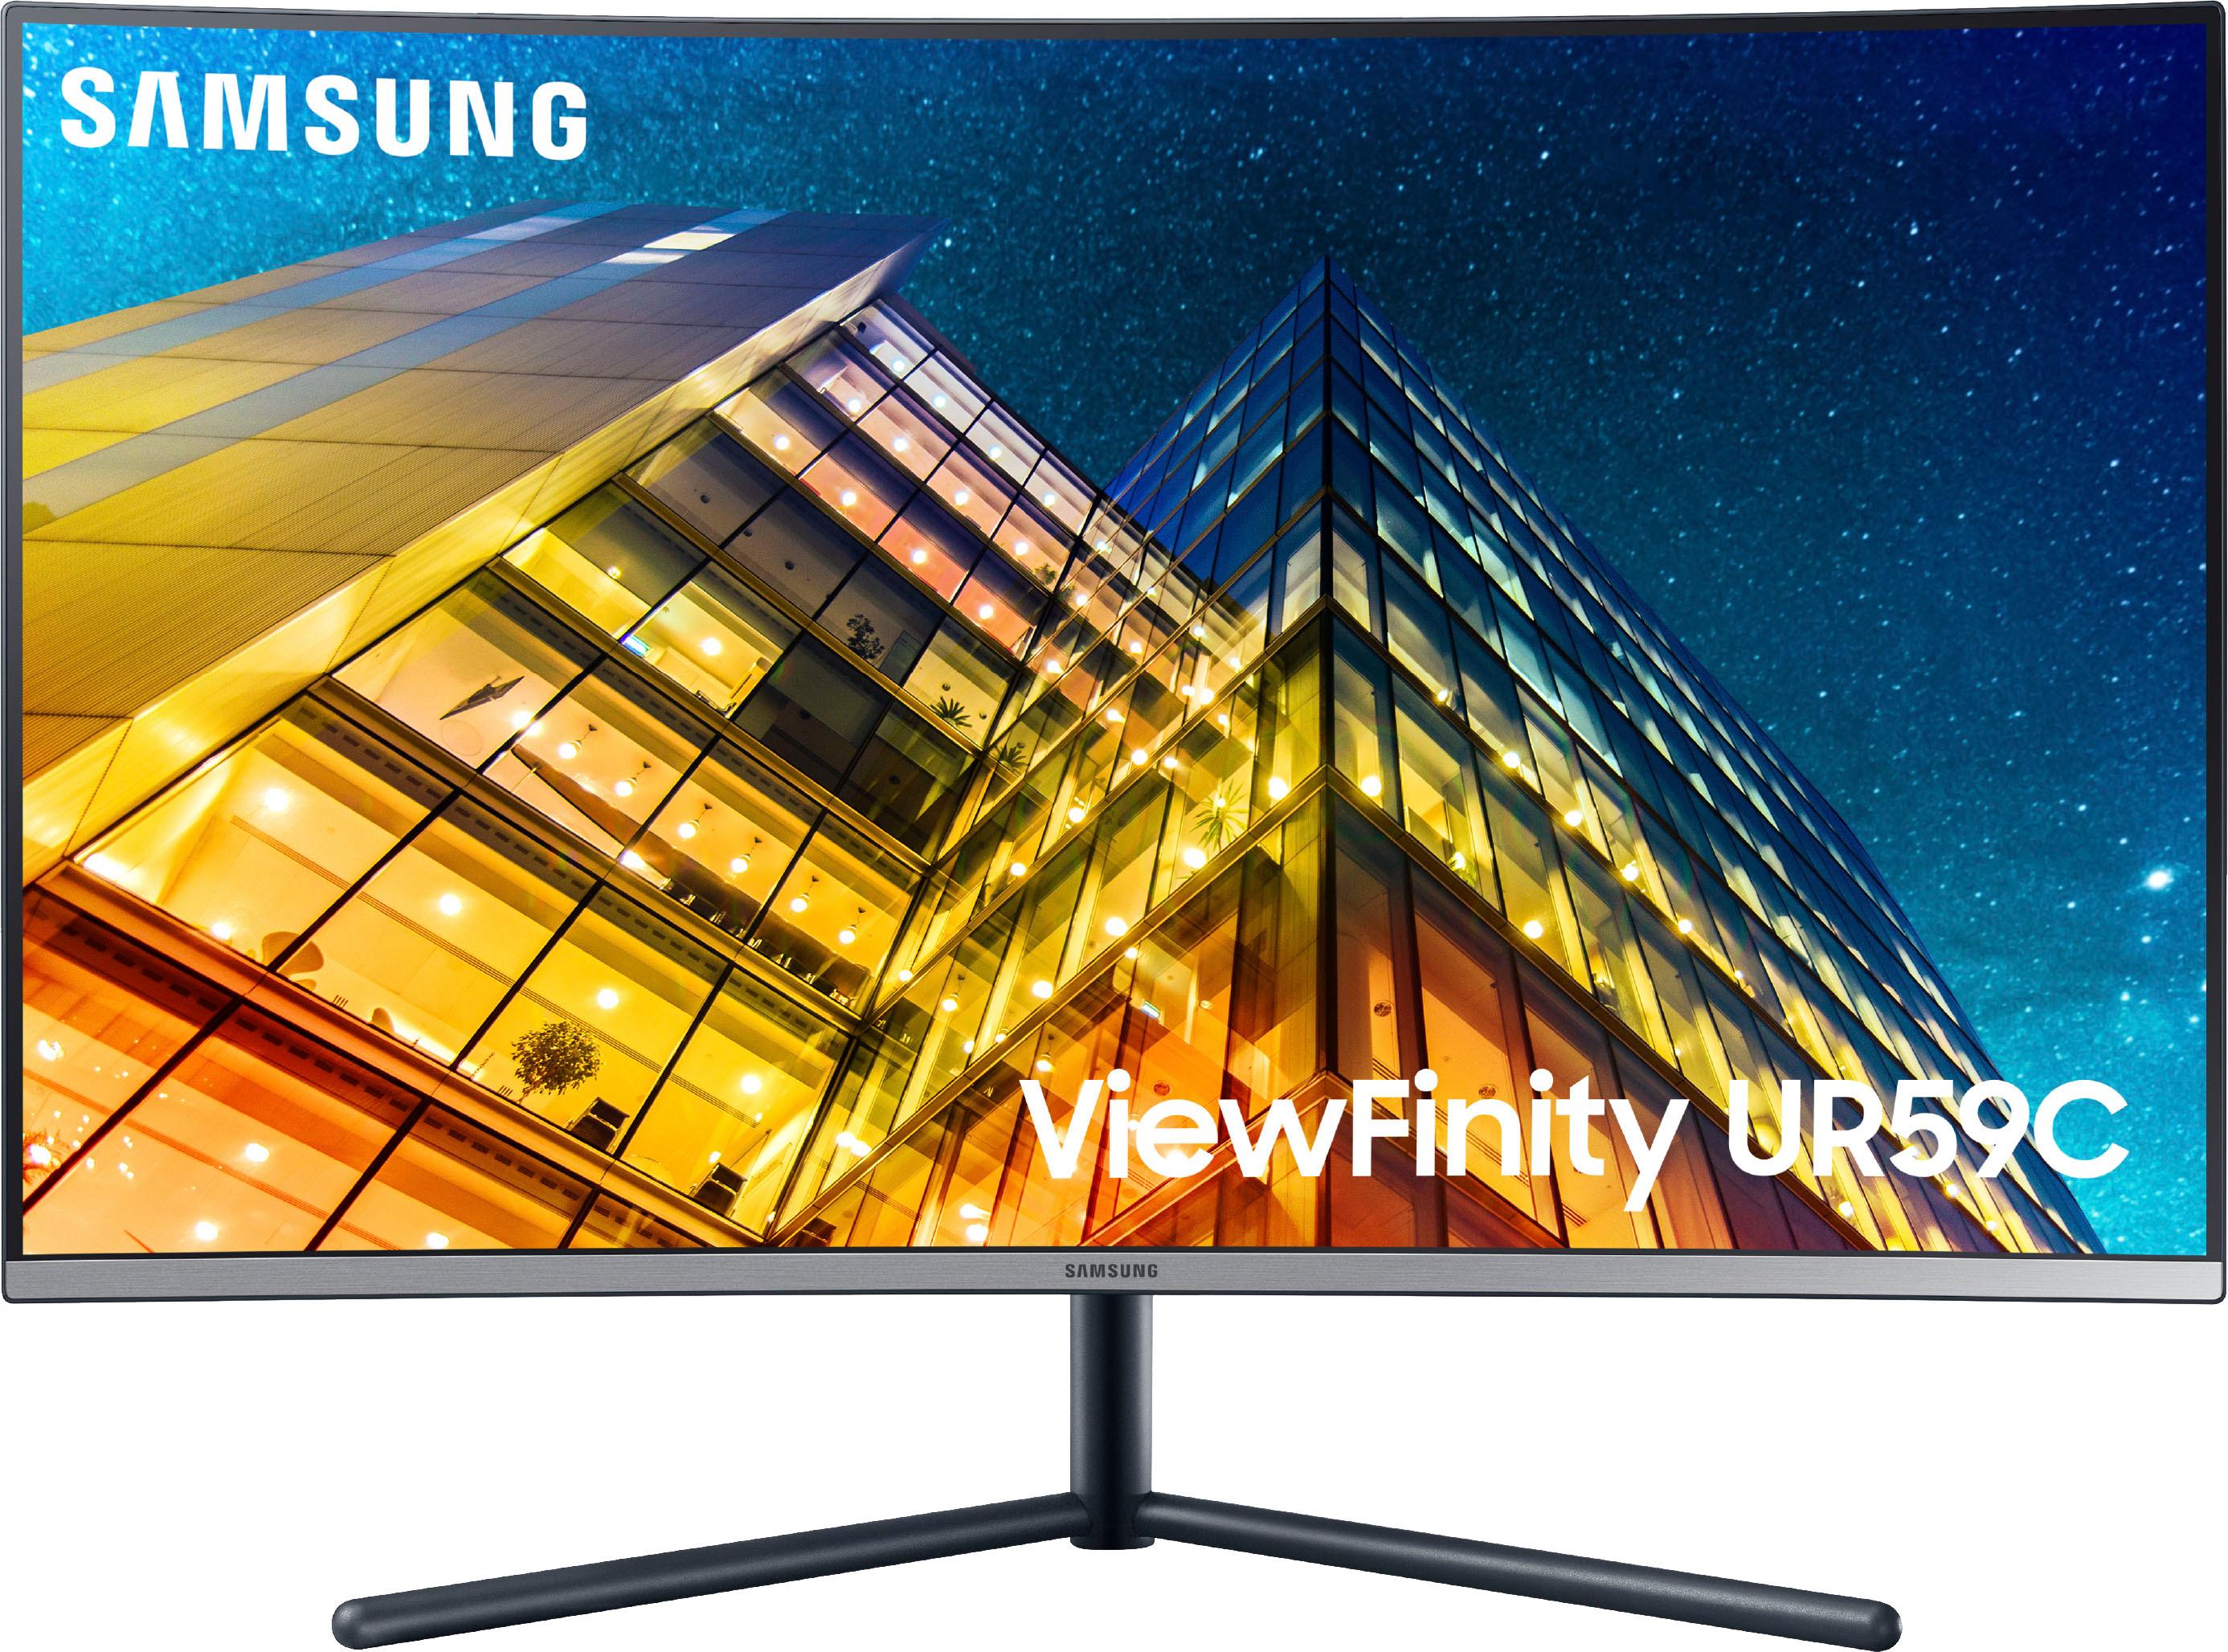 "Samsung 31.5"" LCD Curved 4K UHD Monitor Dark Blue Gray U32R590C"